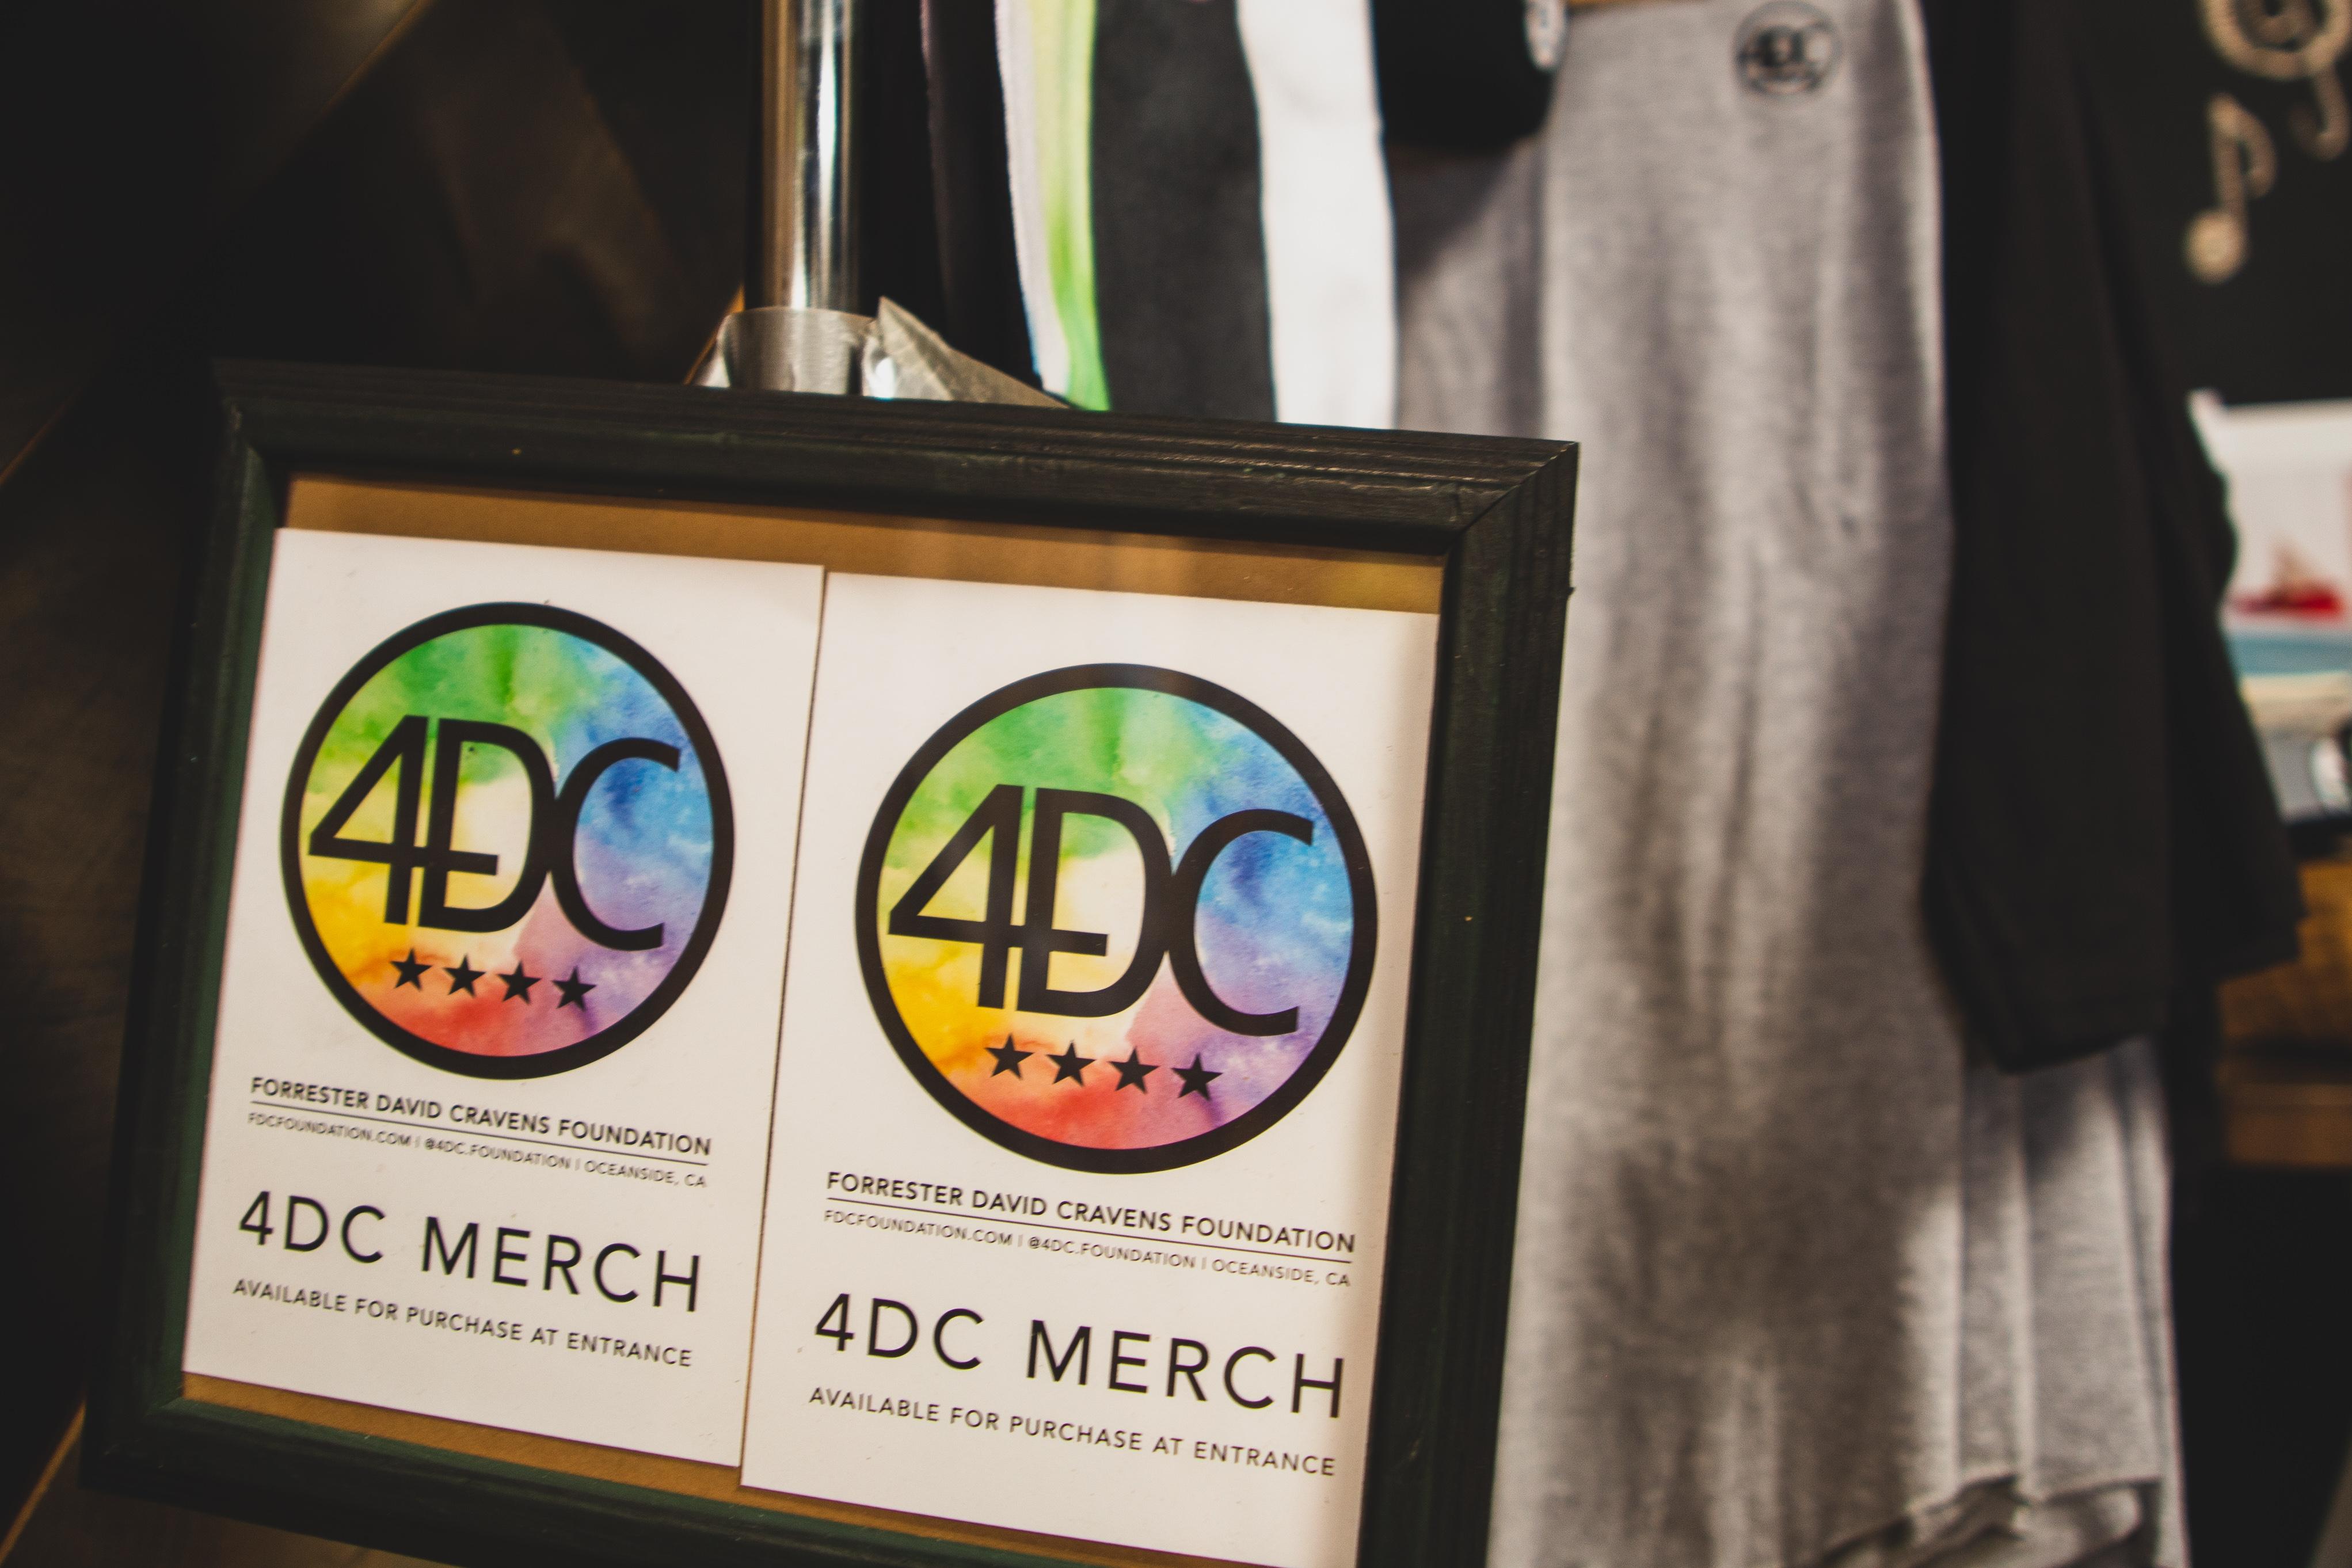 FDC Merch